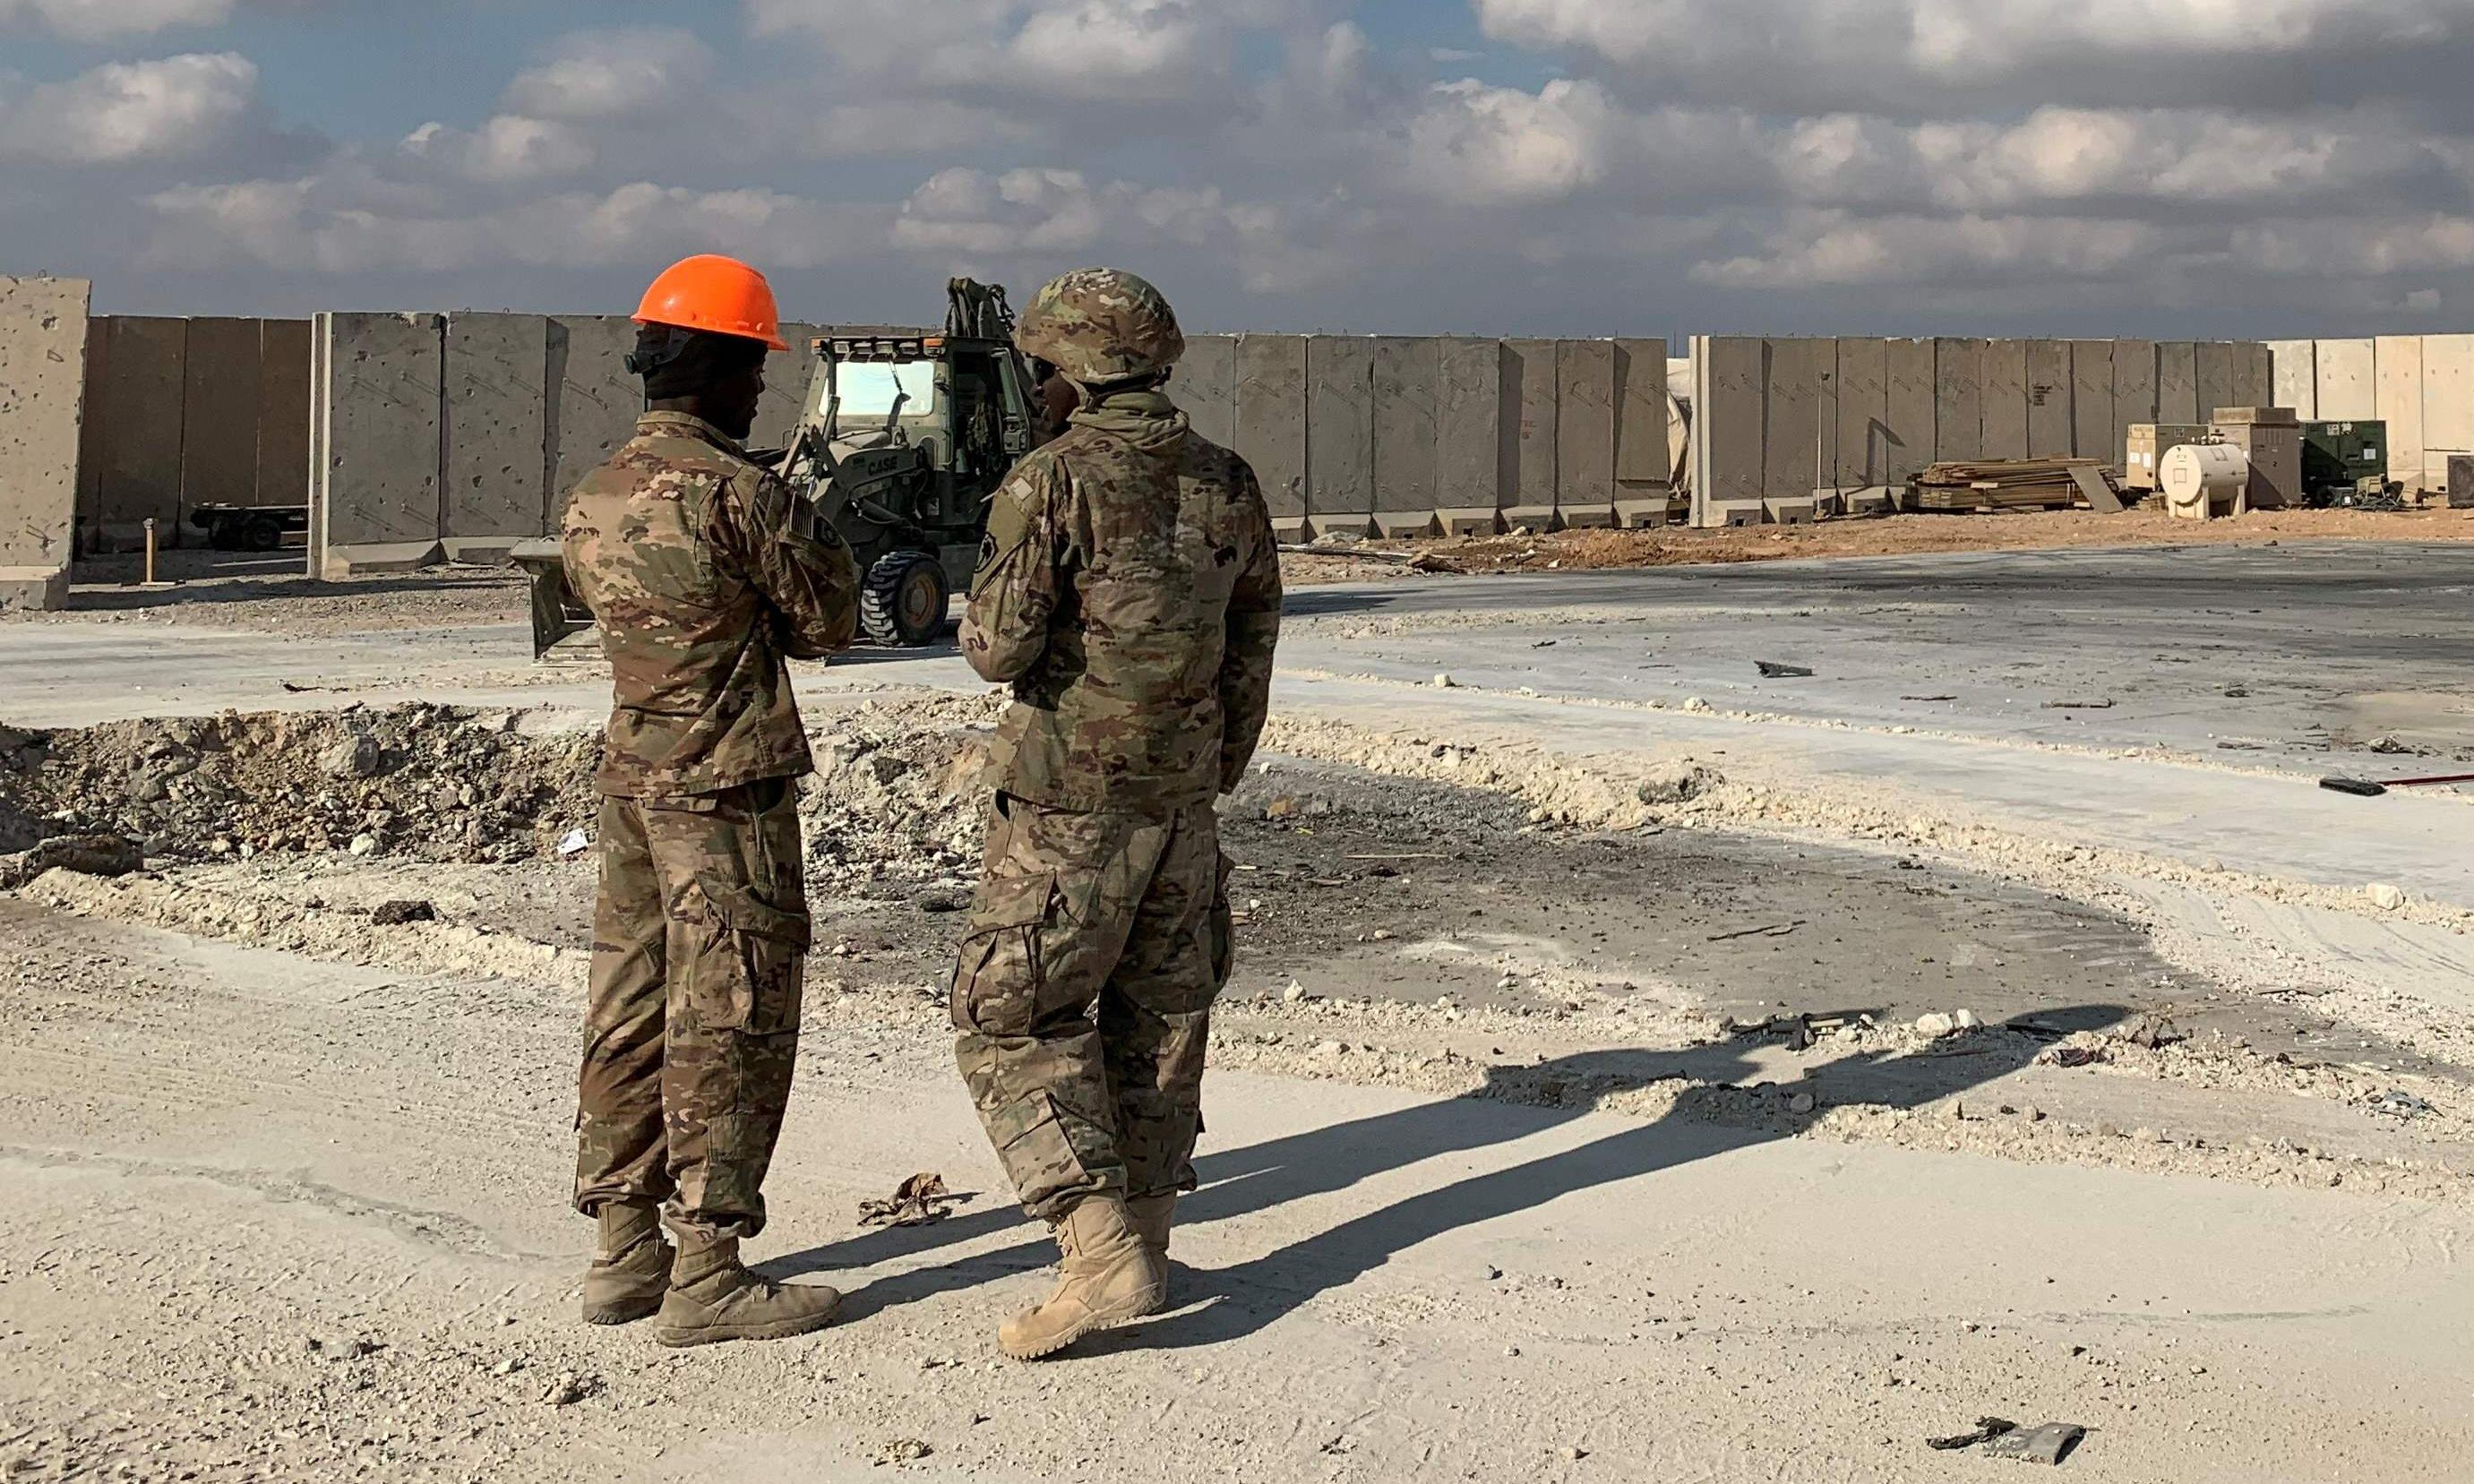 Baghdad explosions: rockets strike near US embassy in Iraq